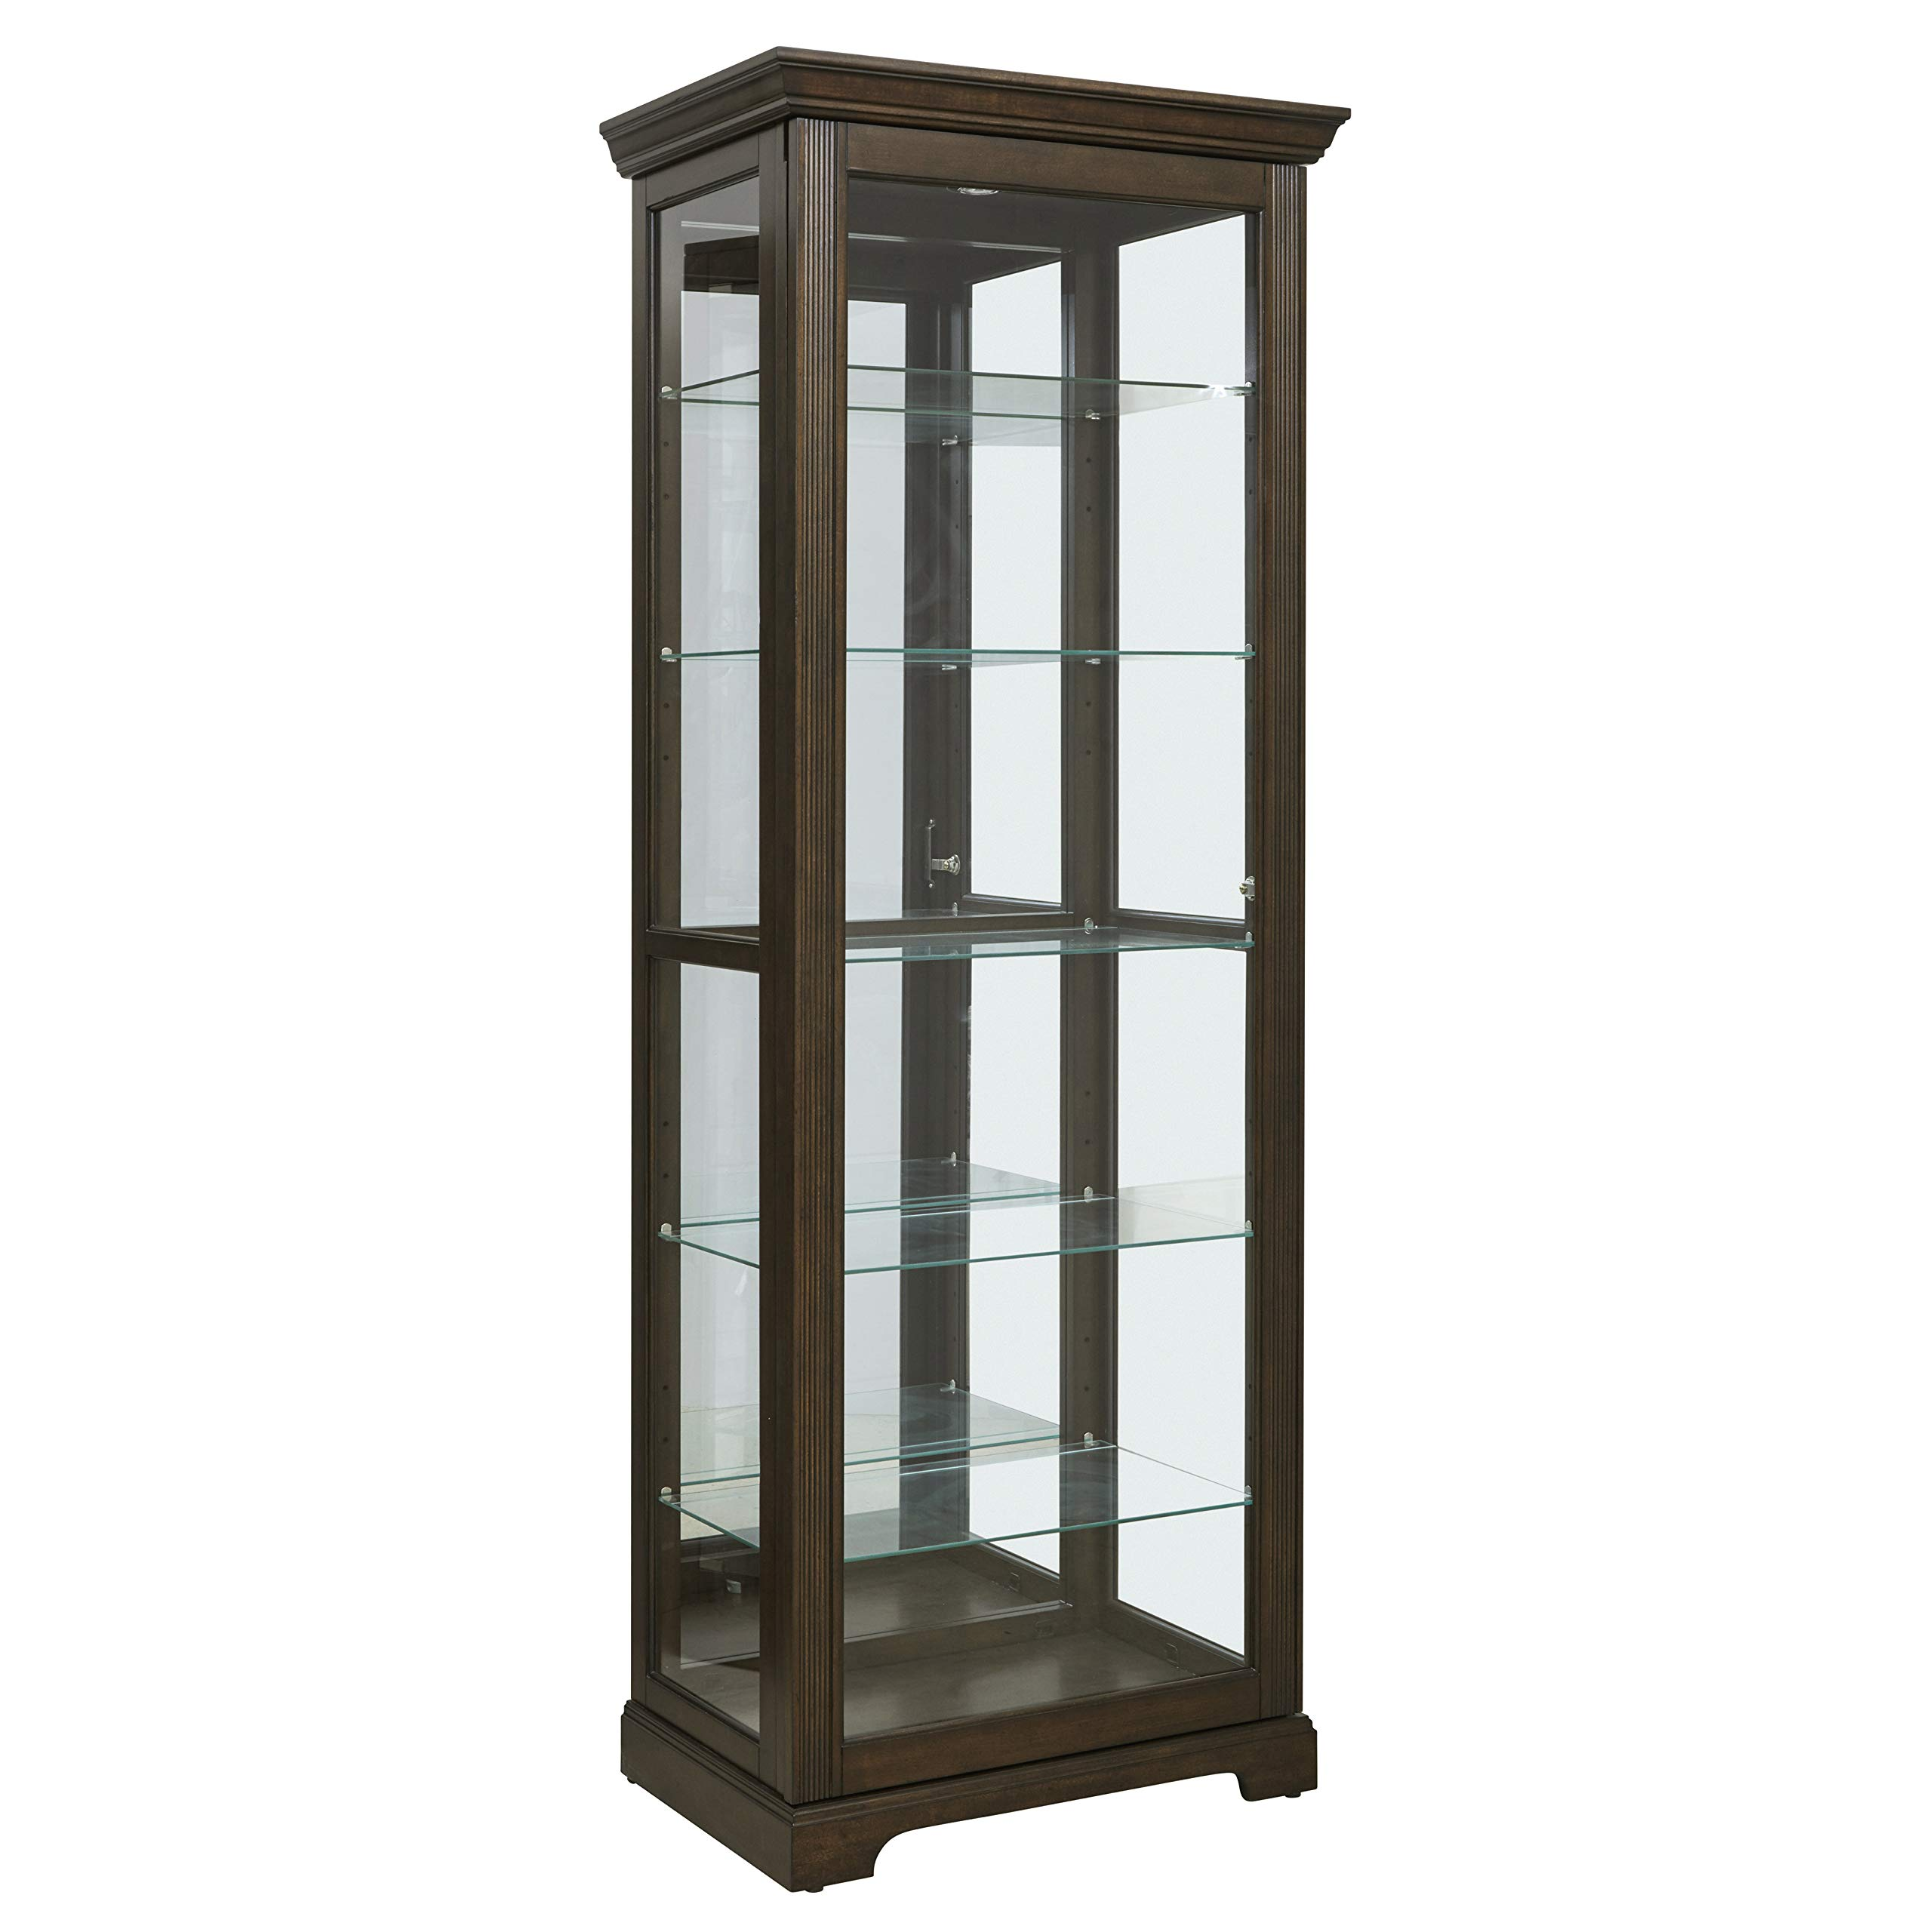 Pulaski  Locking Sliding Door Curio Display Cabinet, 29.25'' L x 19.5'' W x 80.0'' H, Cherry by Pulaski